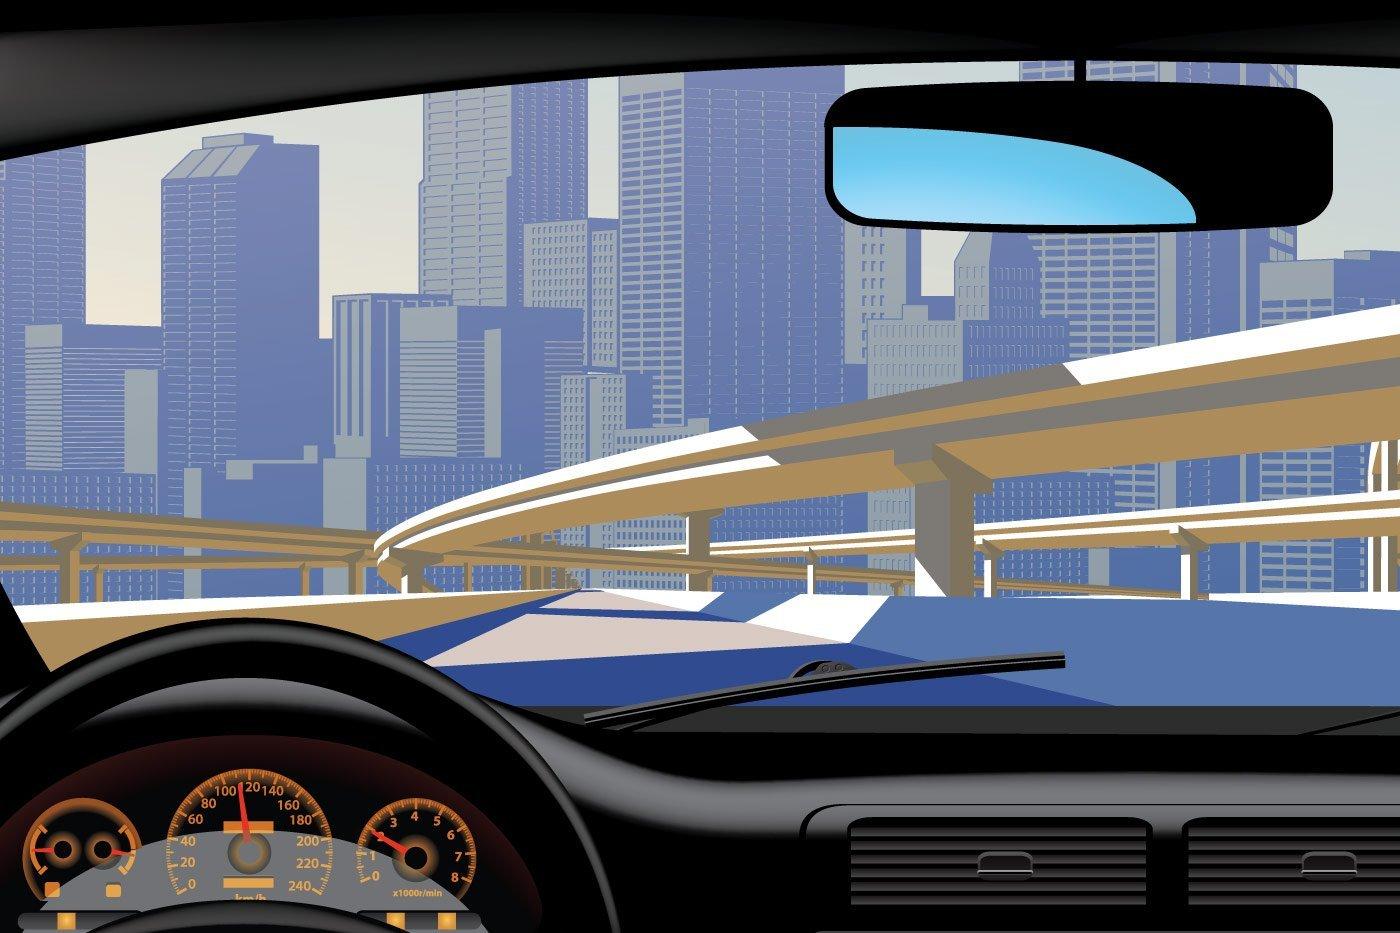 Car - Motor vehicle